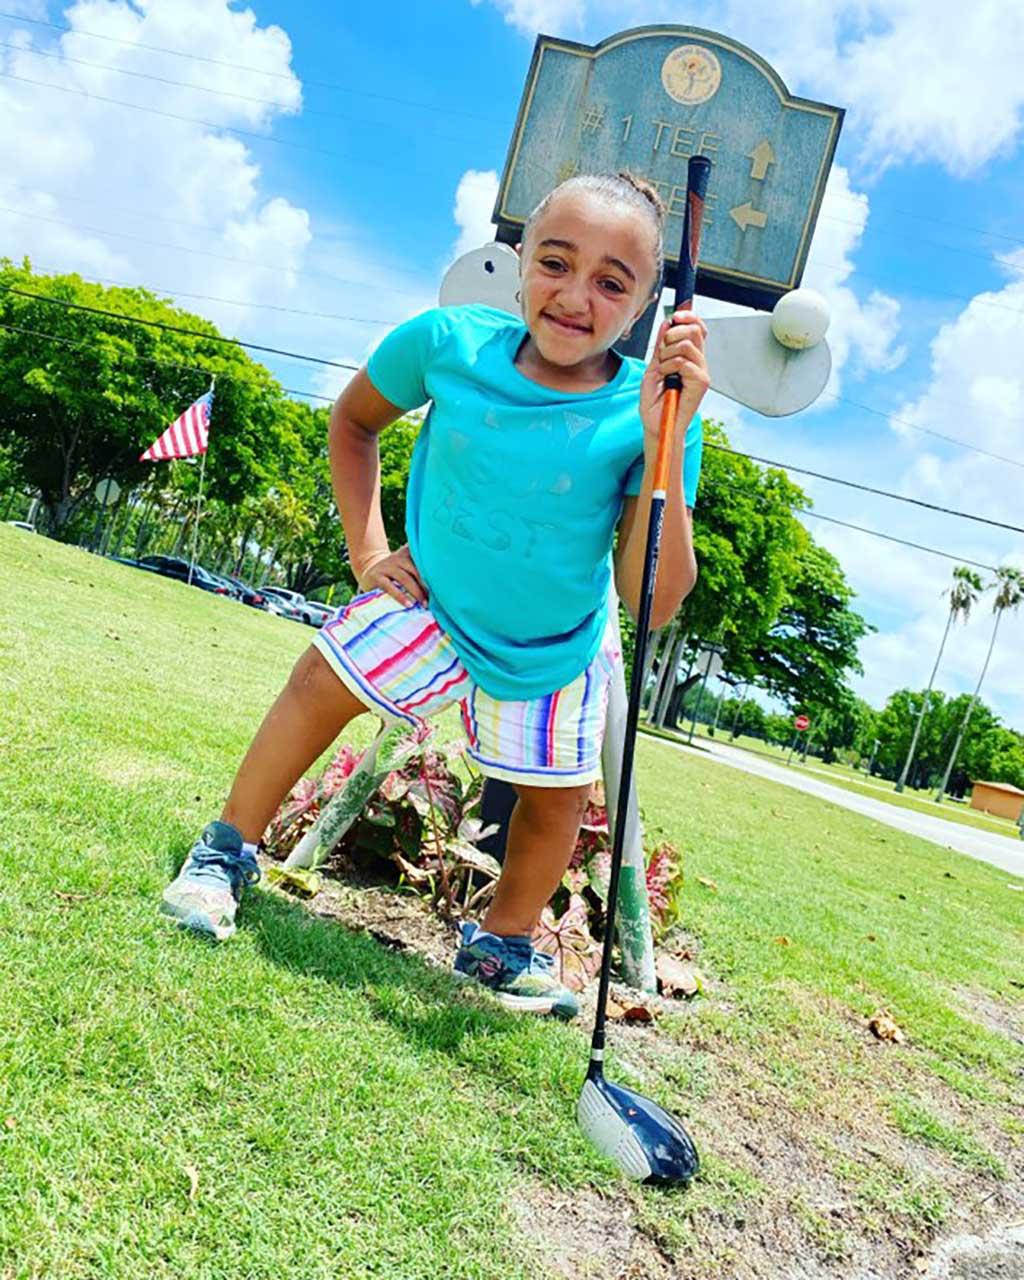 Amariah Joy fights through Brittle Bone Disease at the Country Club